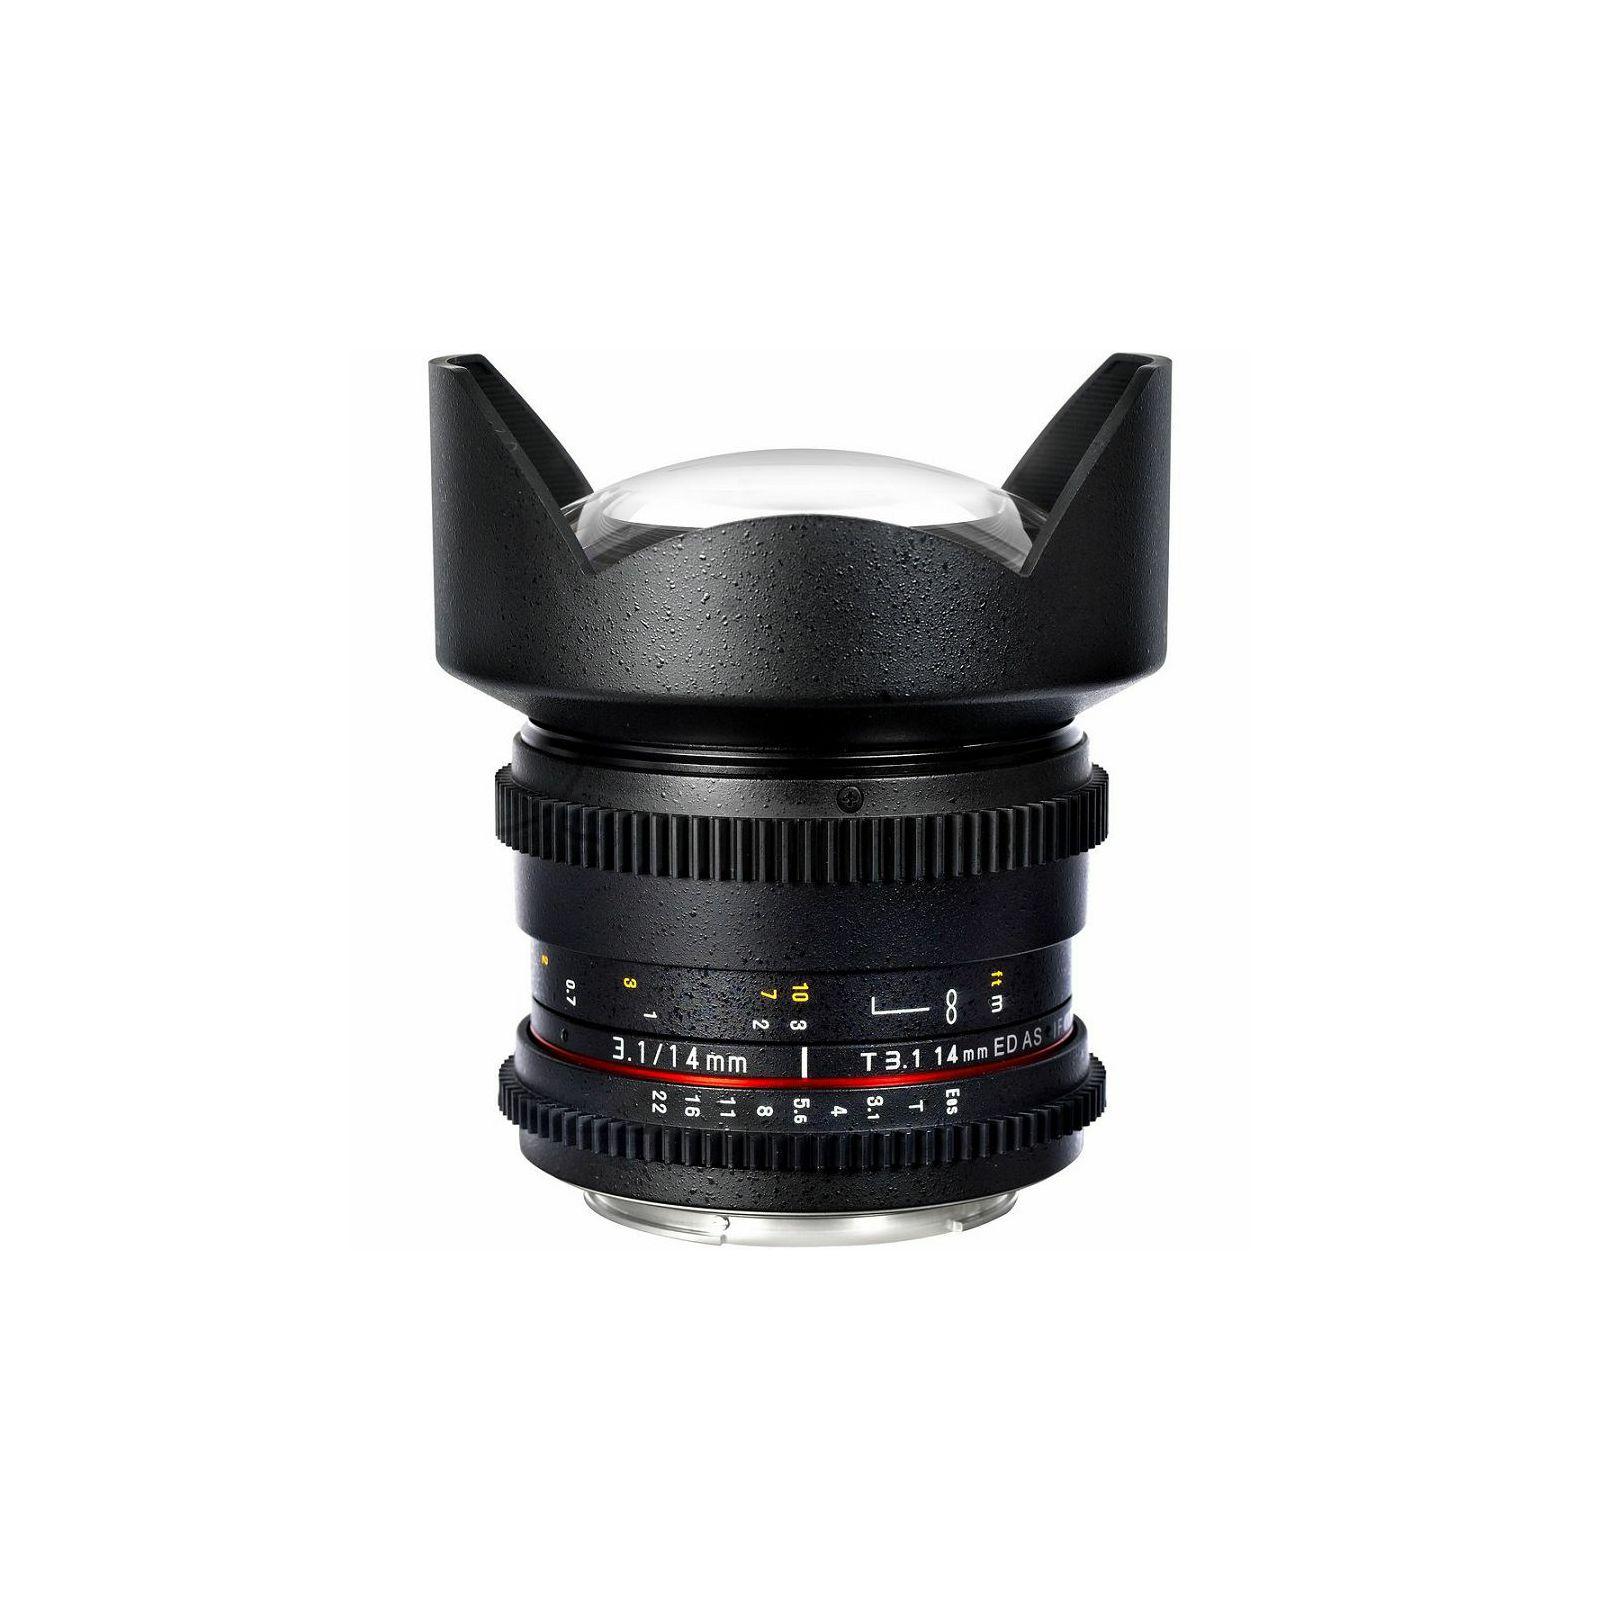 Samyang 14mm T3.1 ED AS IF UMC VDSLR širokokutni objektiv za Nikon FX